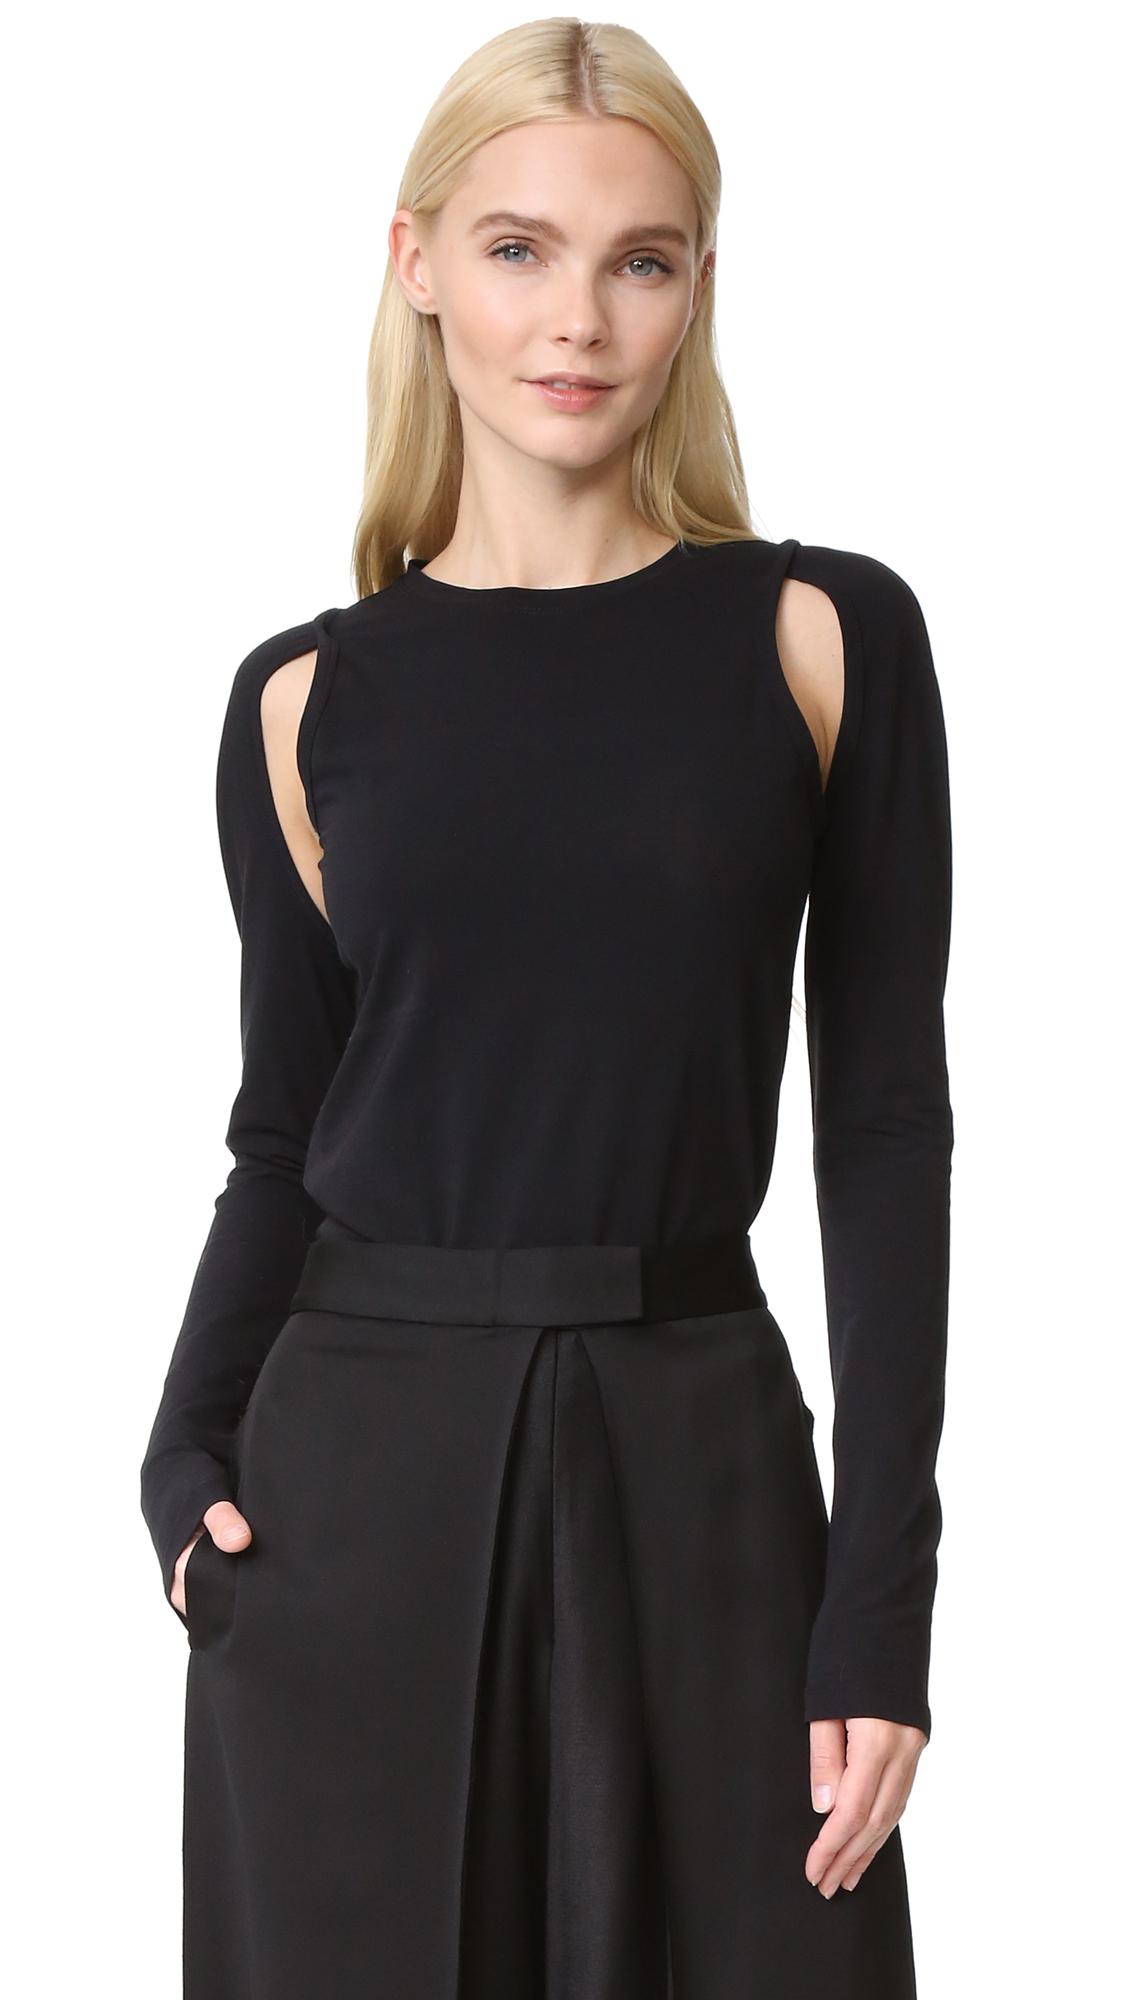 Dkny Knit Top With Cutouts - Black at Shopbop